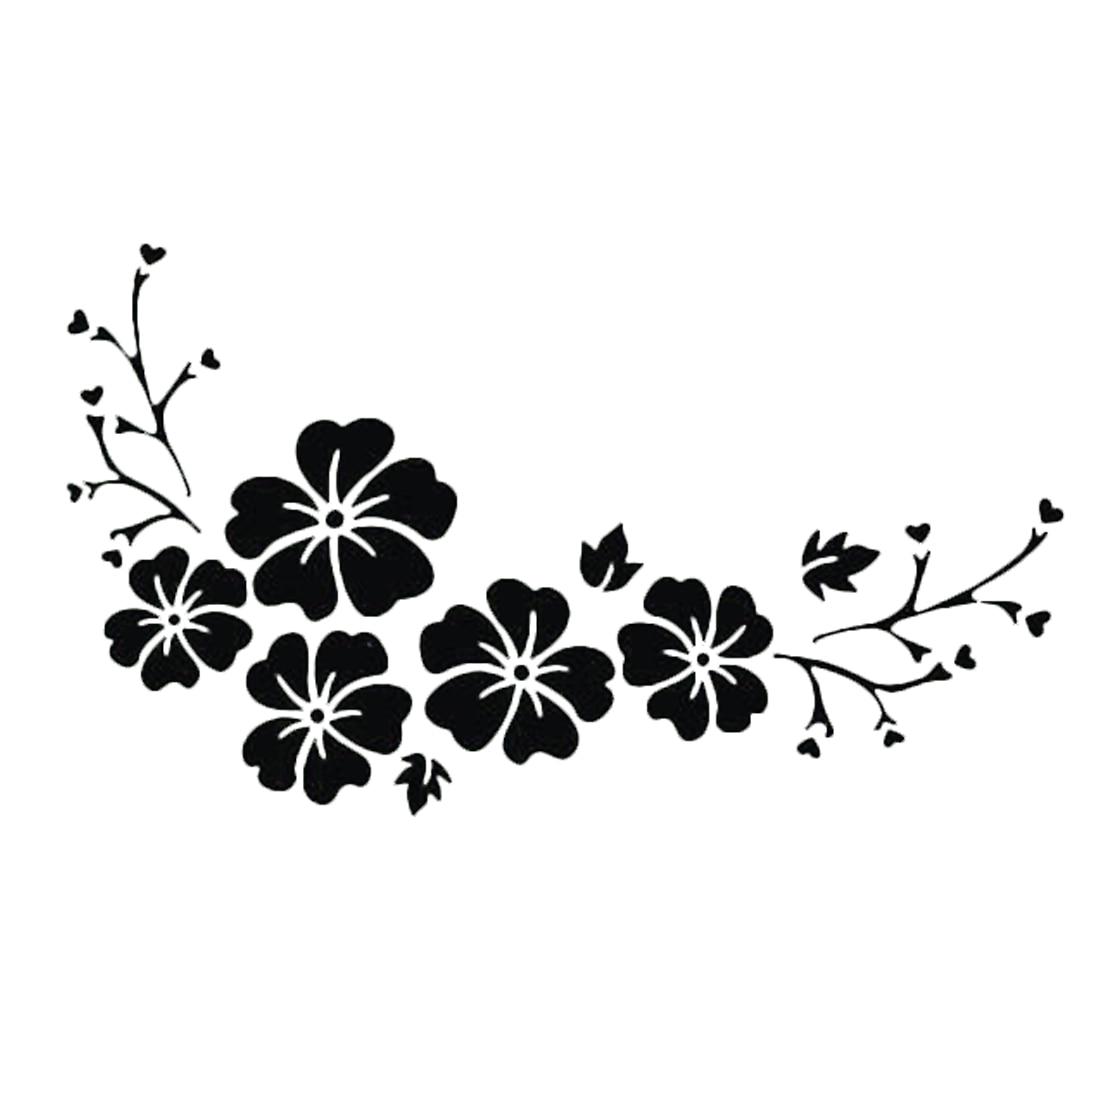 DAWASARU Waterproof Sticker Engraving Flower Pattern Car Sticker Delicate Decal Car Window Wall Bumper Decal Custom 15*7 CM